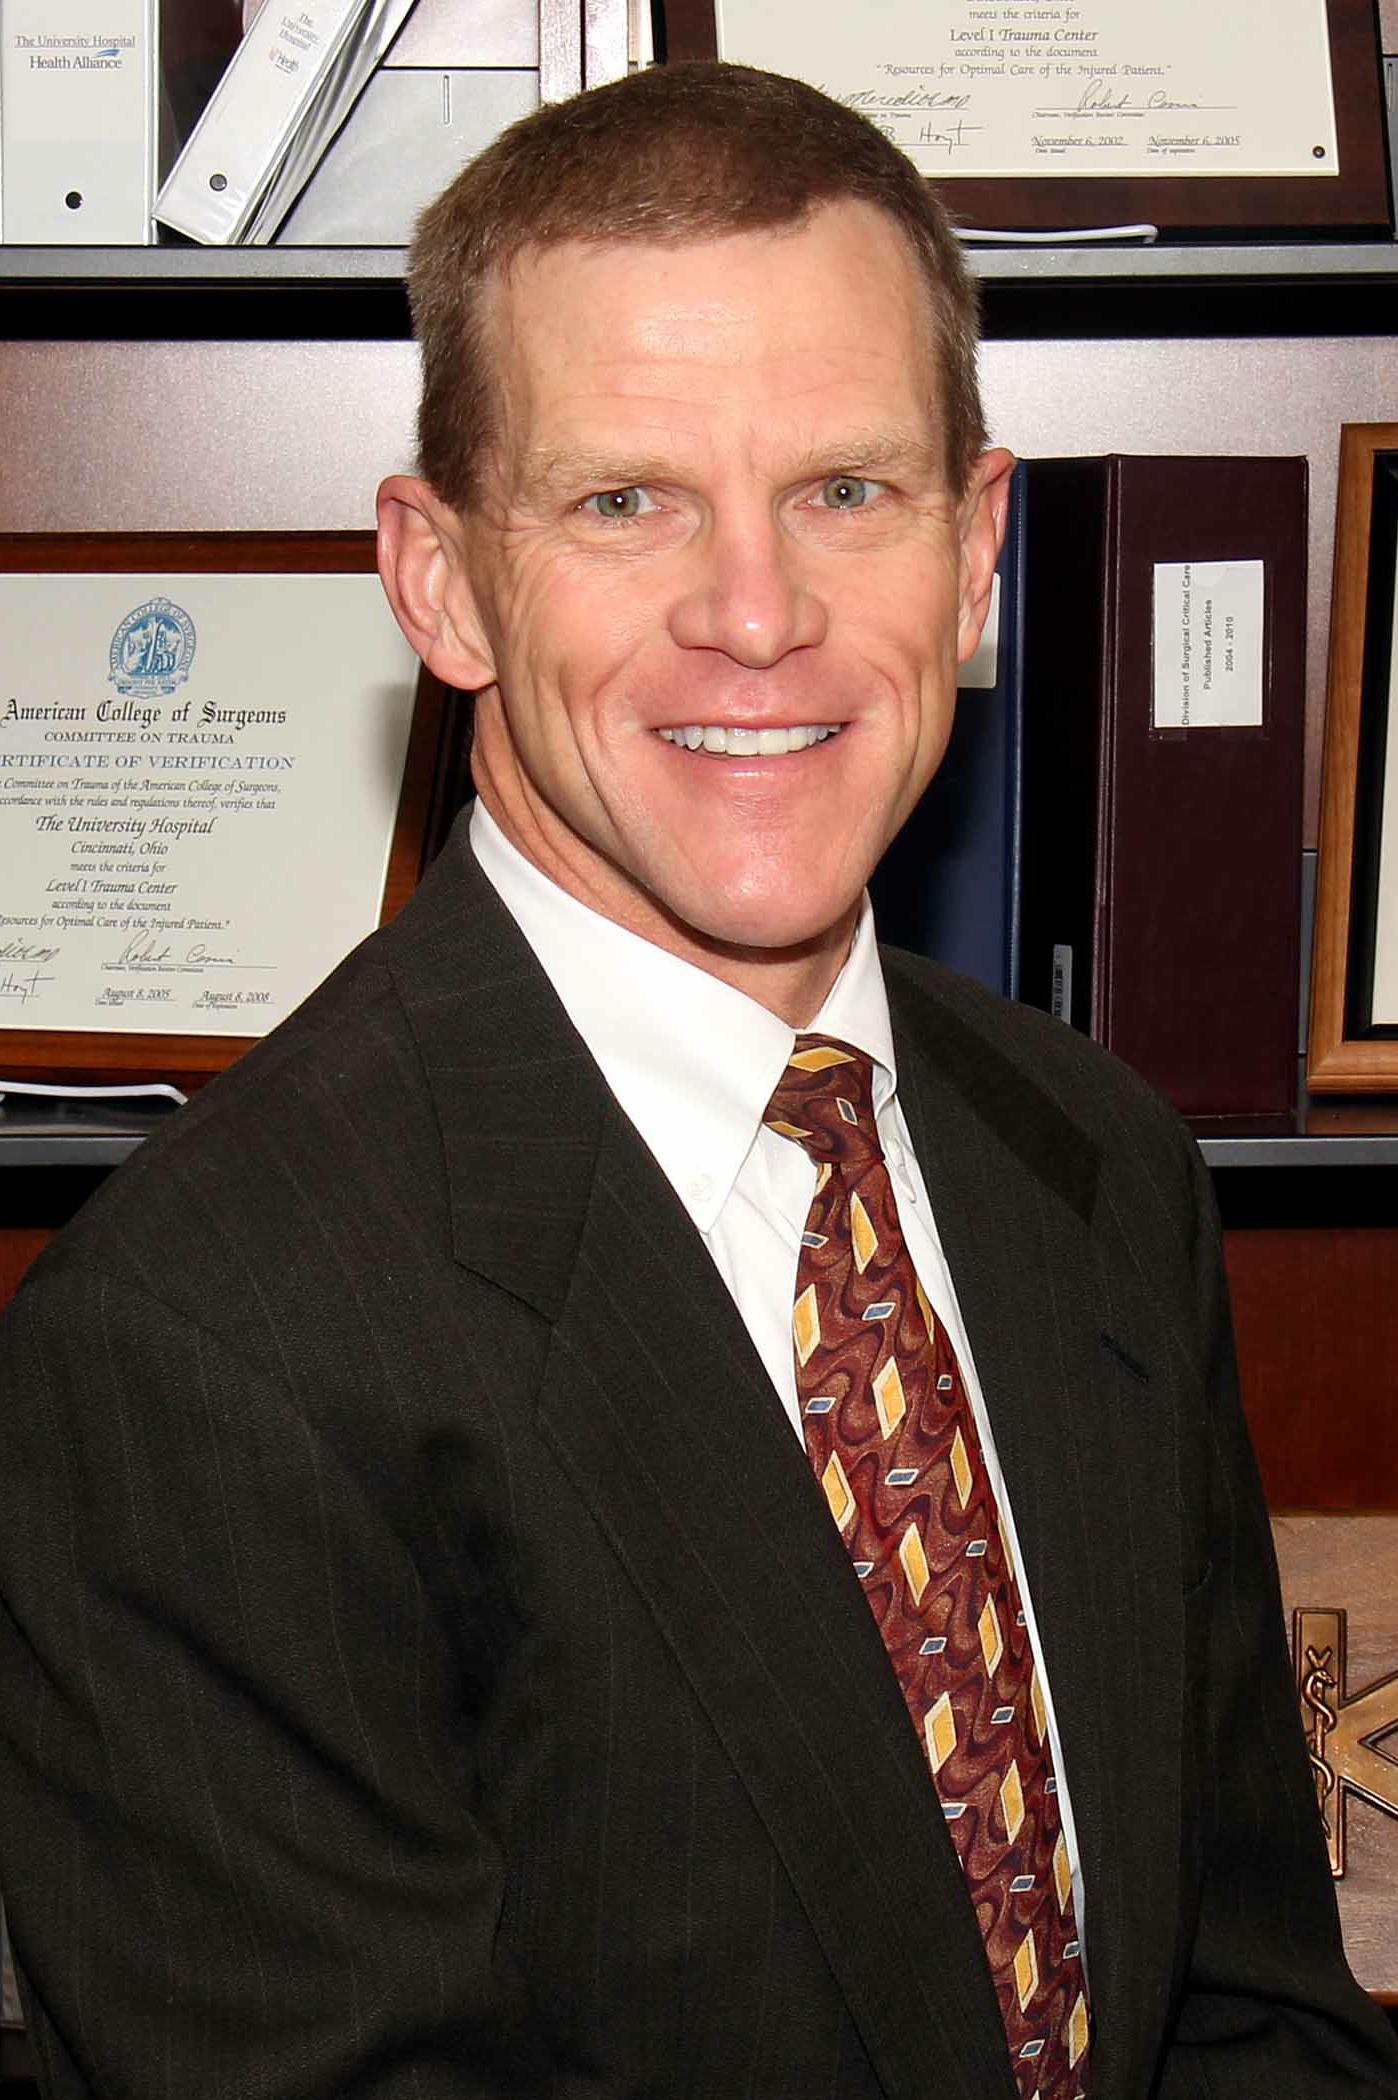 Dr. Jay Johanningman, M.D.